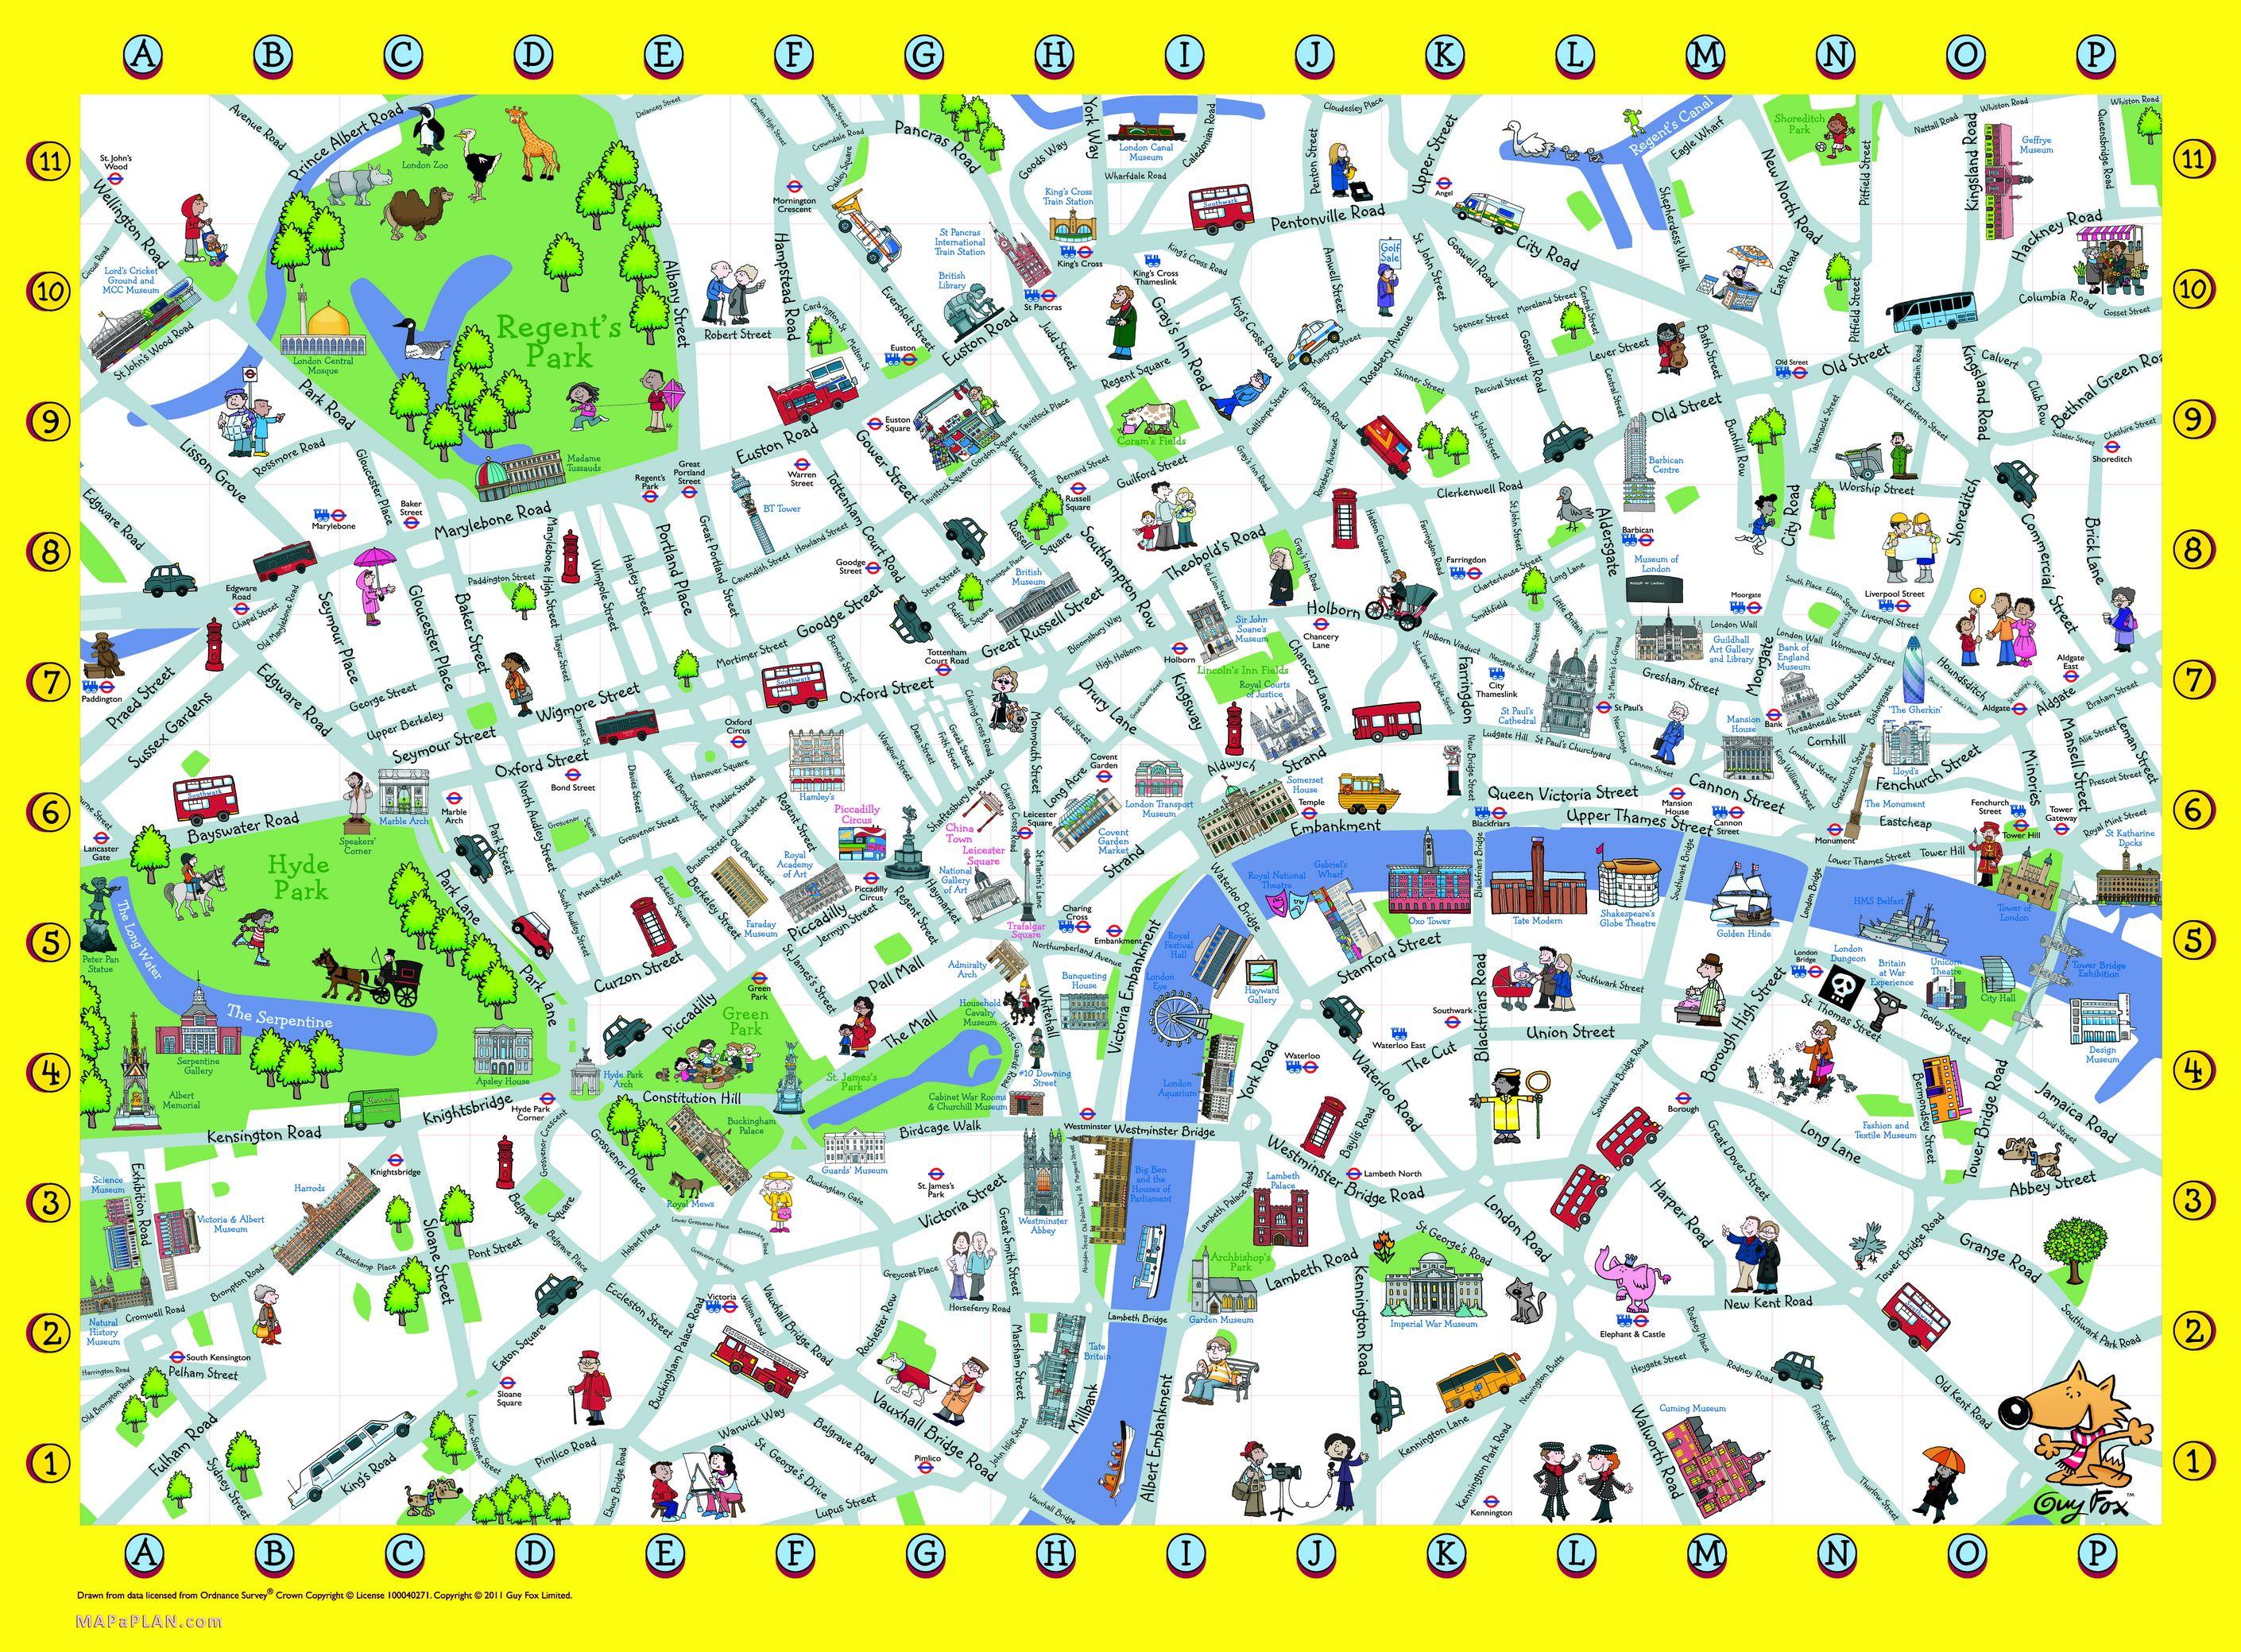 London Detailed Landmark Map   London Maps - Top Tourist Attractions - Free Printable Tourist Map London